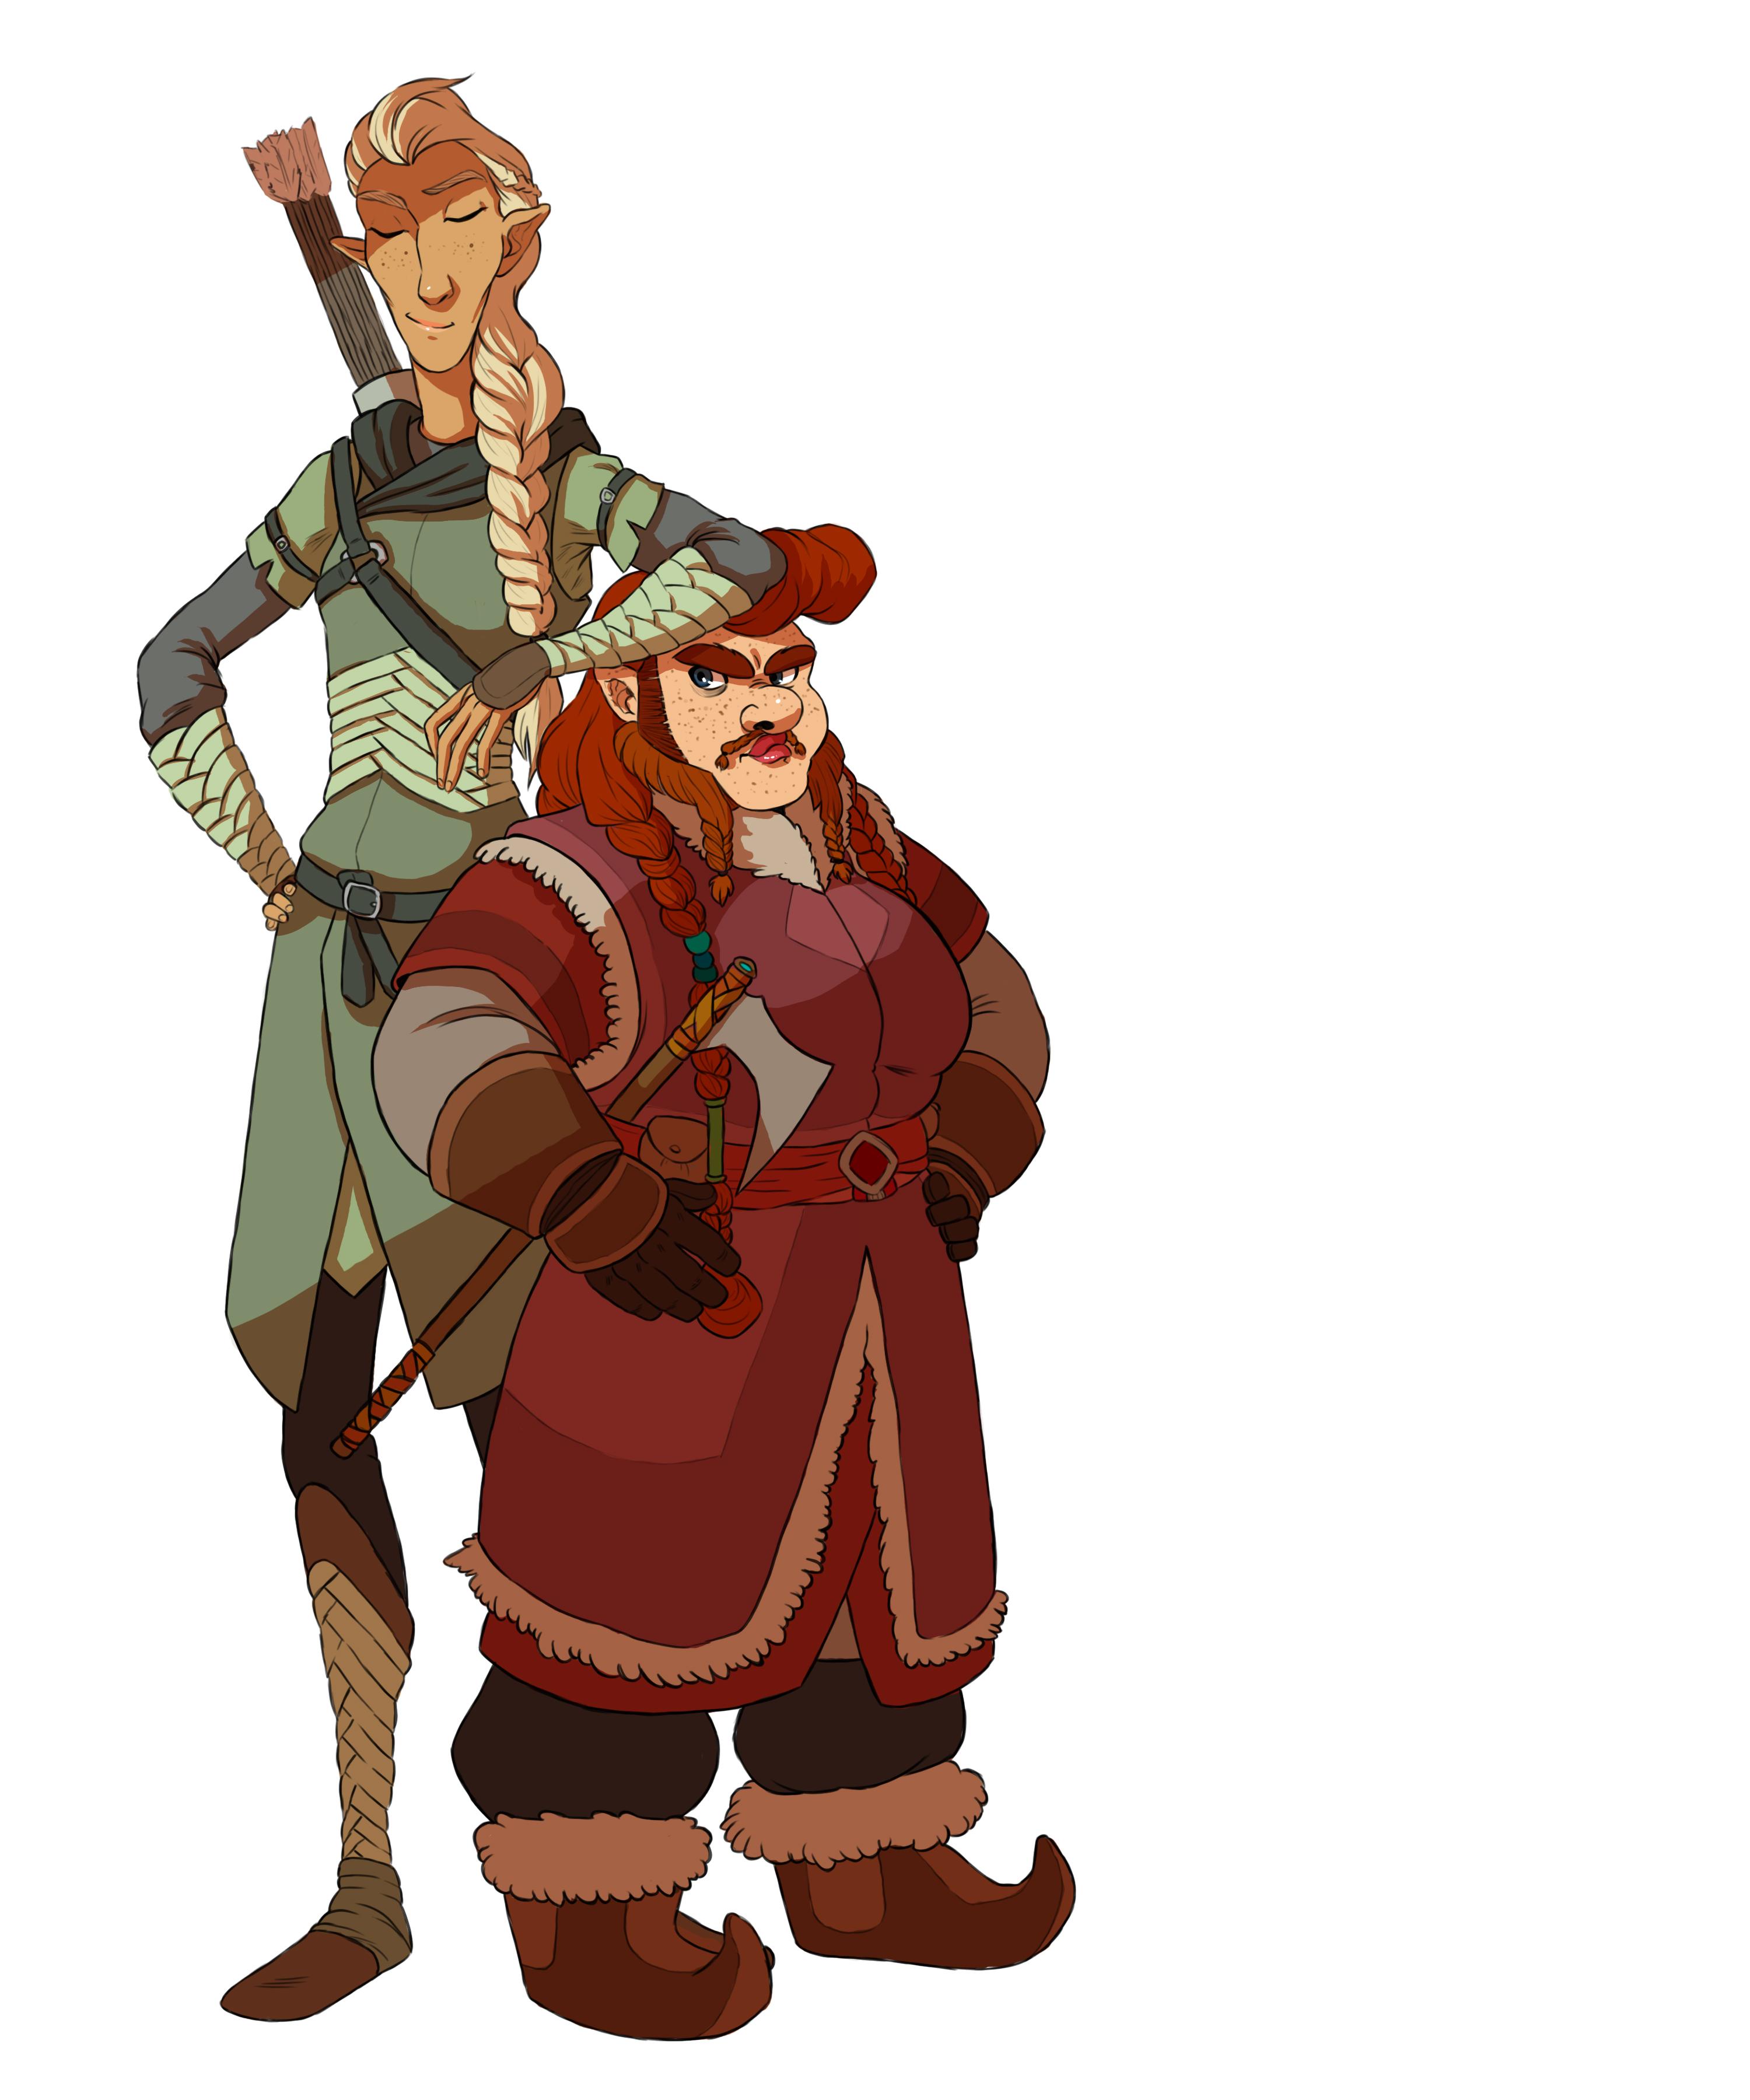 Legolas and Gimli by fUnKyToEs on DeviantArt